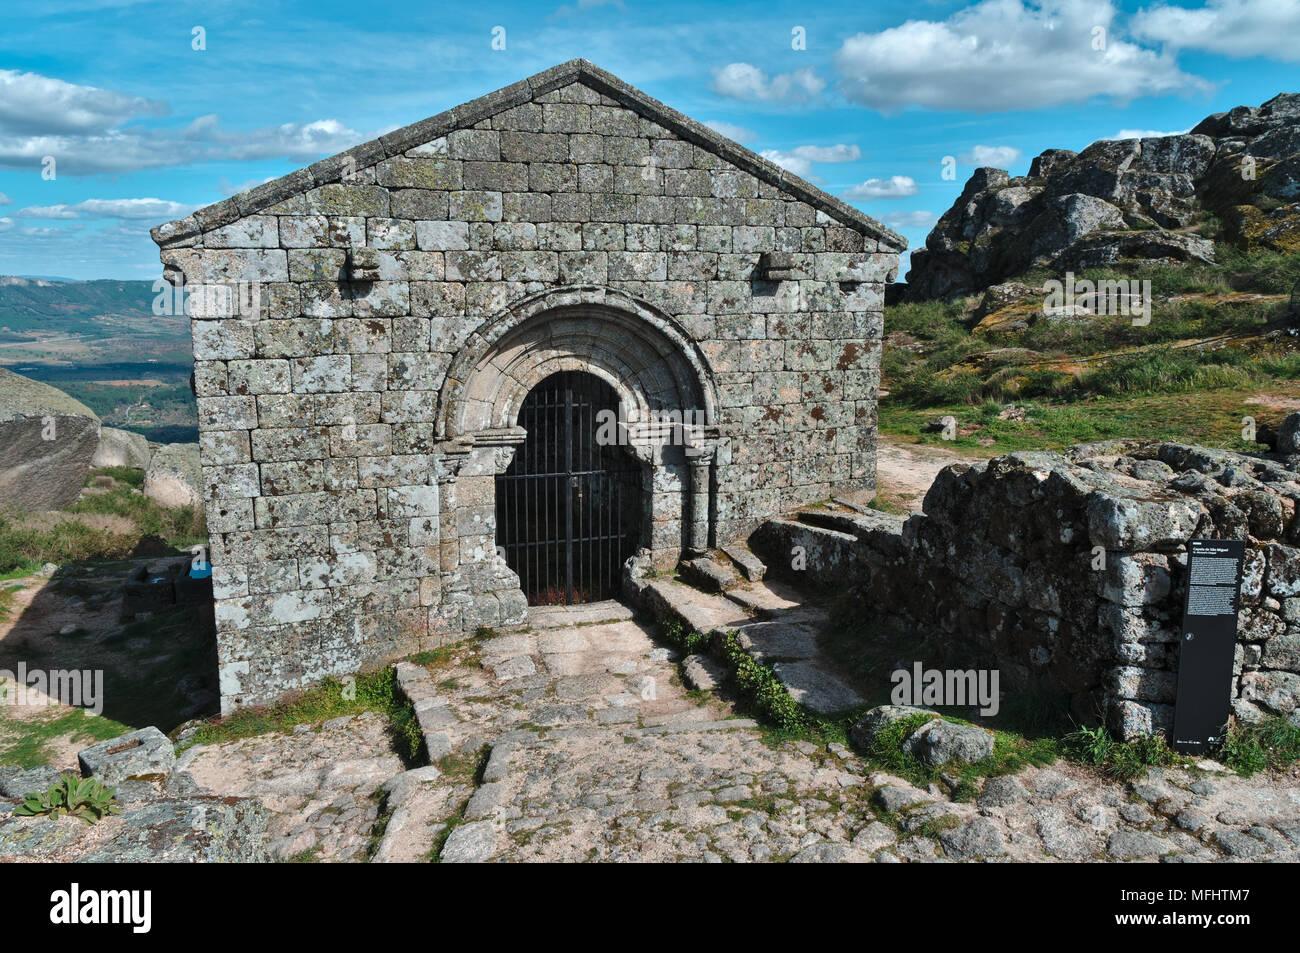 Sao Miguel Chapel in Monsanto. Castelo Branco, Portugal Stock Photo